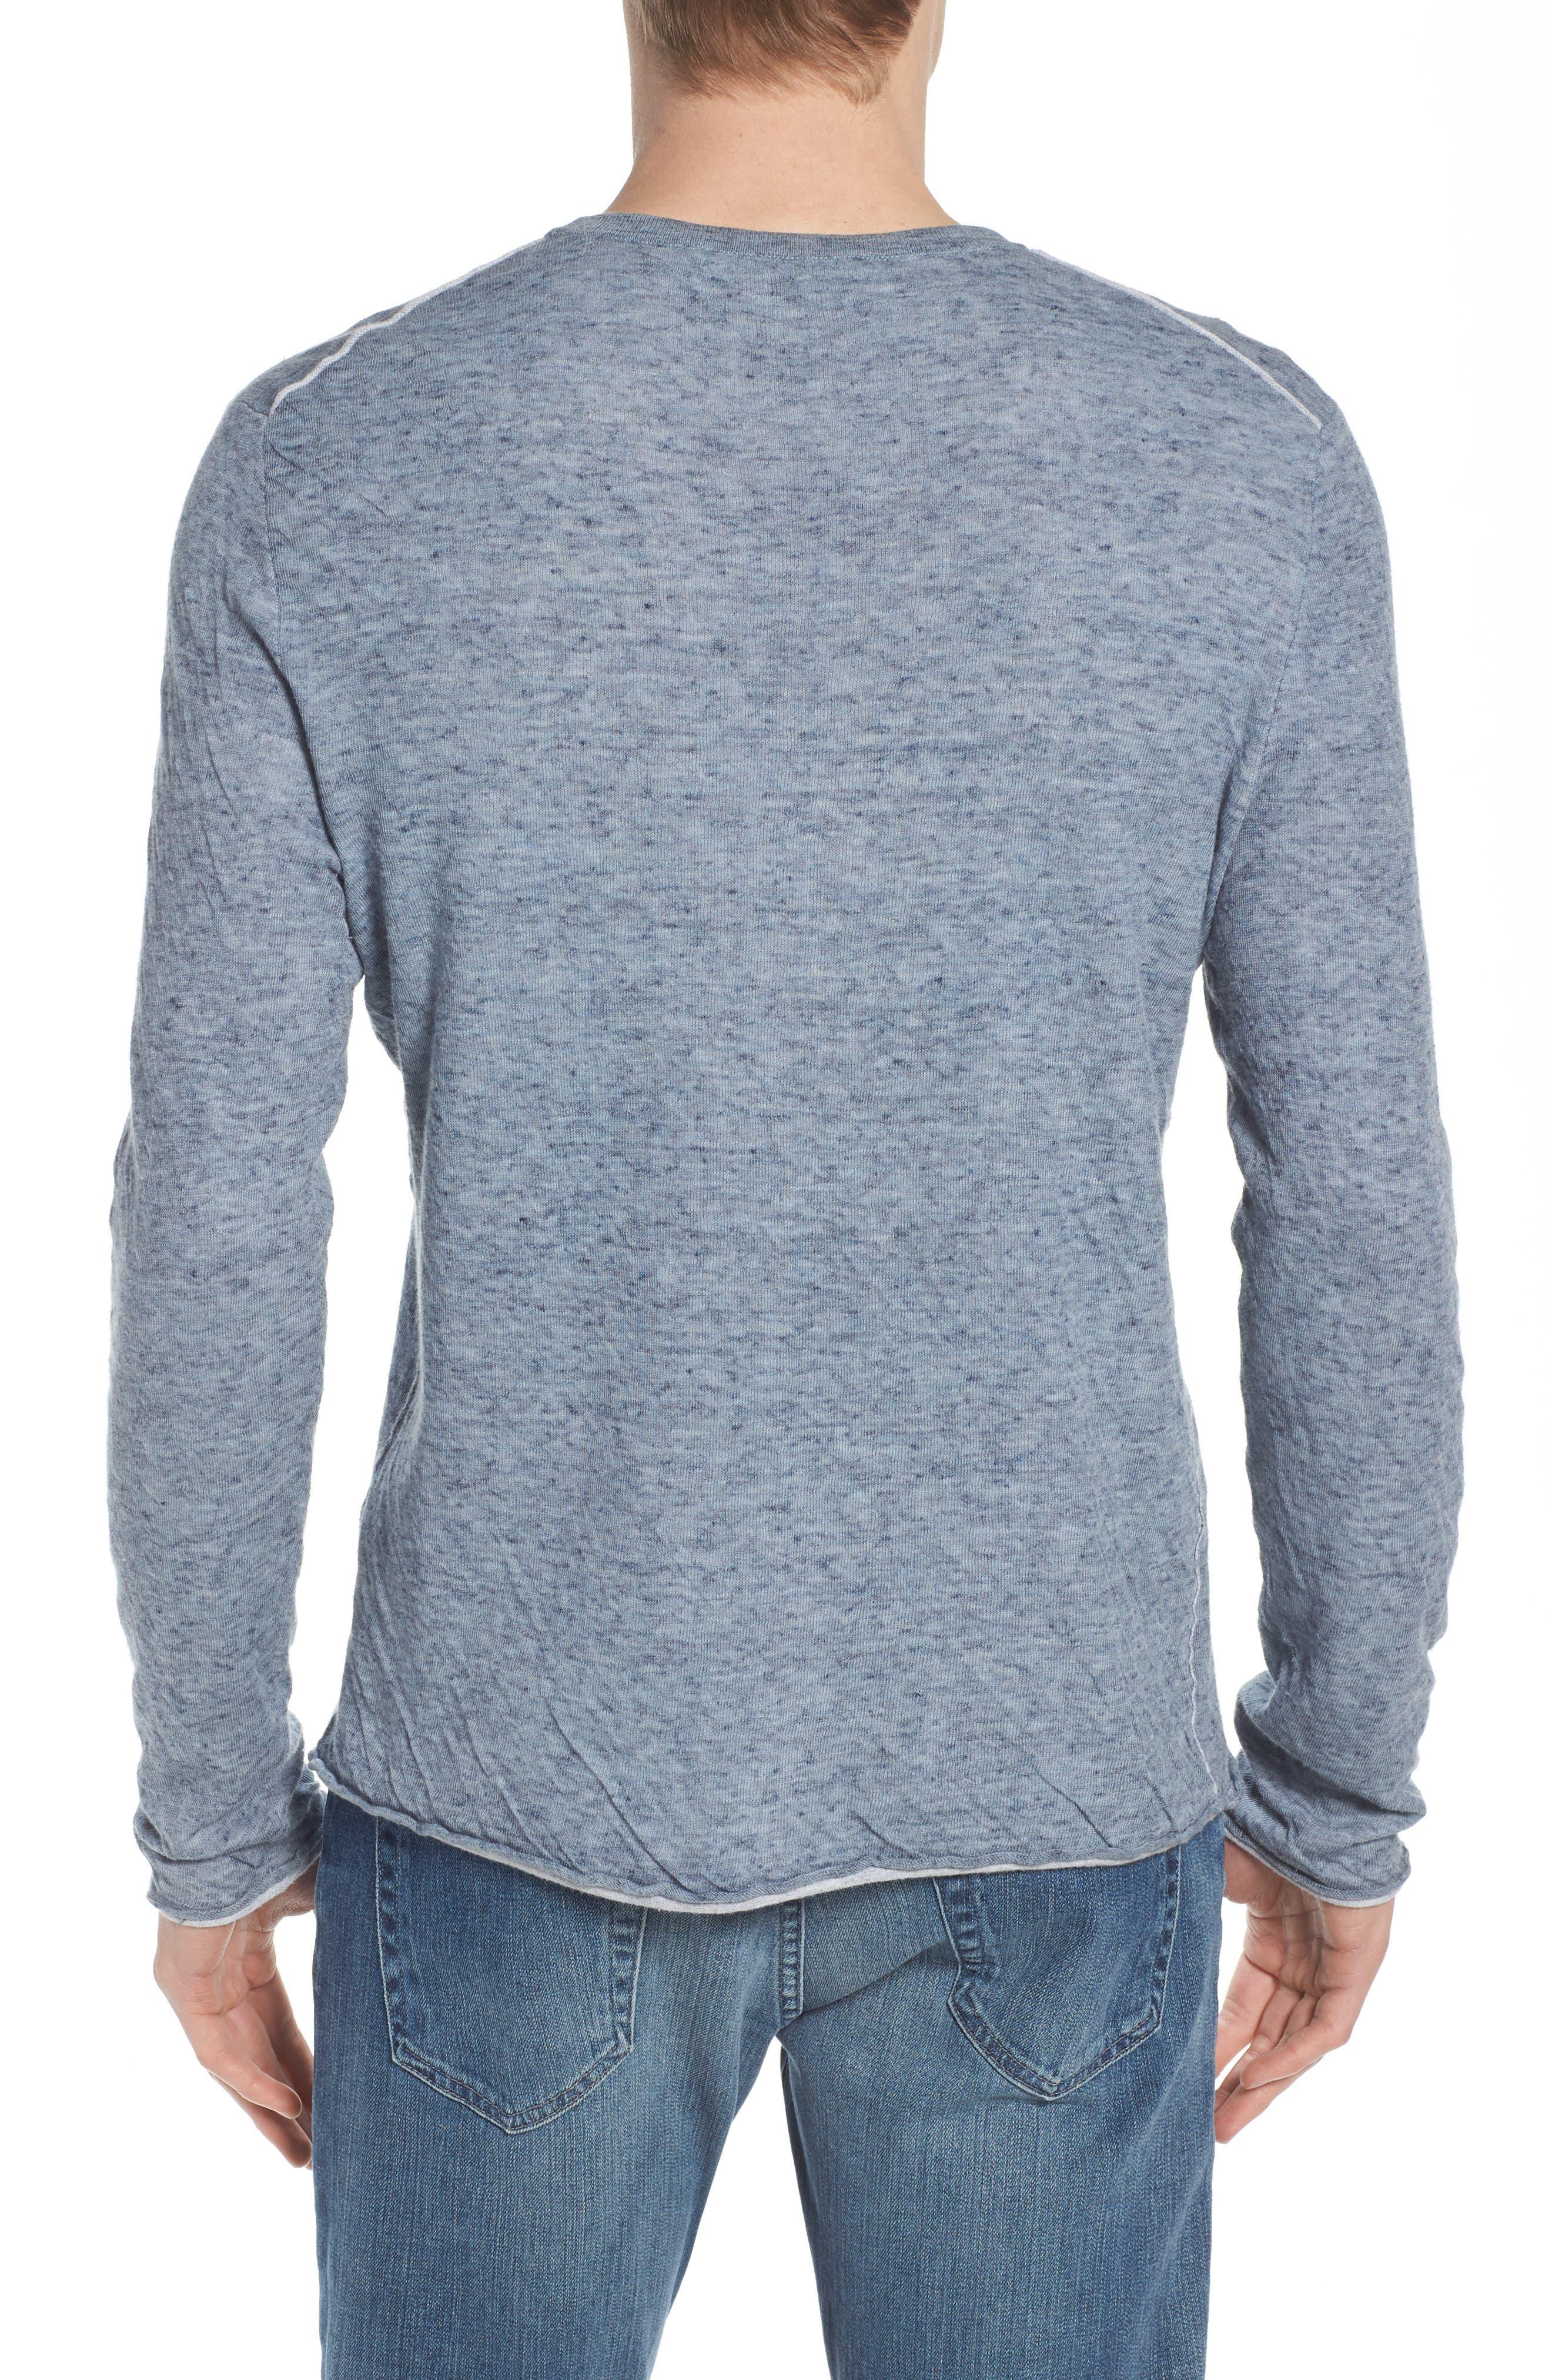 Tripp Regular Fit Crewneck Shirt,                             Alternate thumbnail 2, color,                             LIGHT BLUE